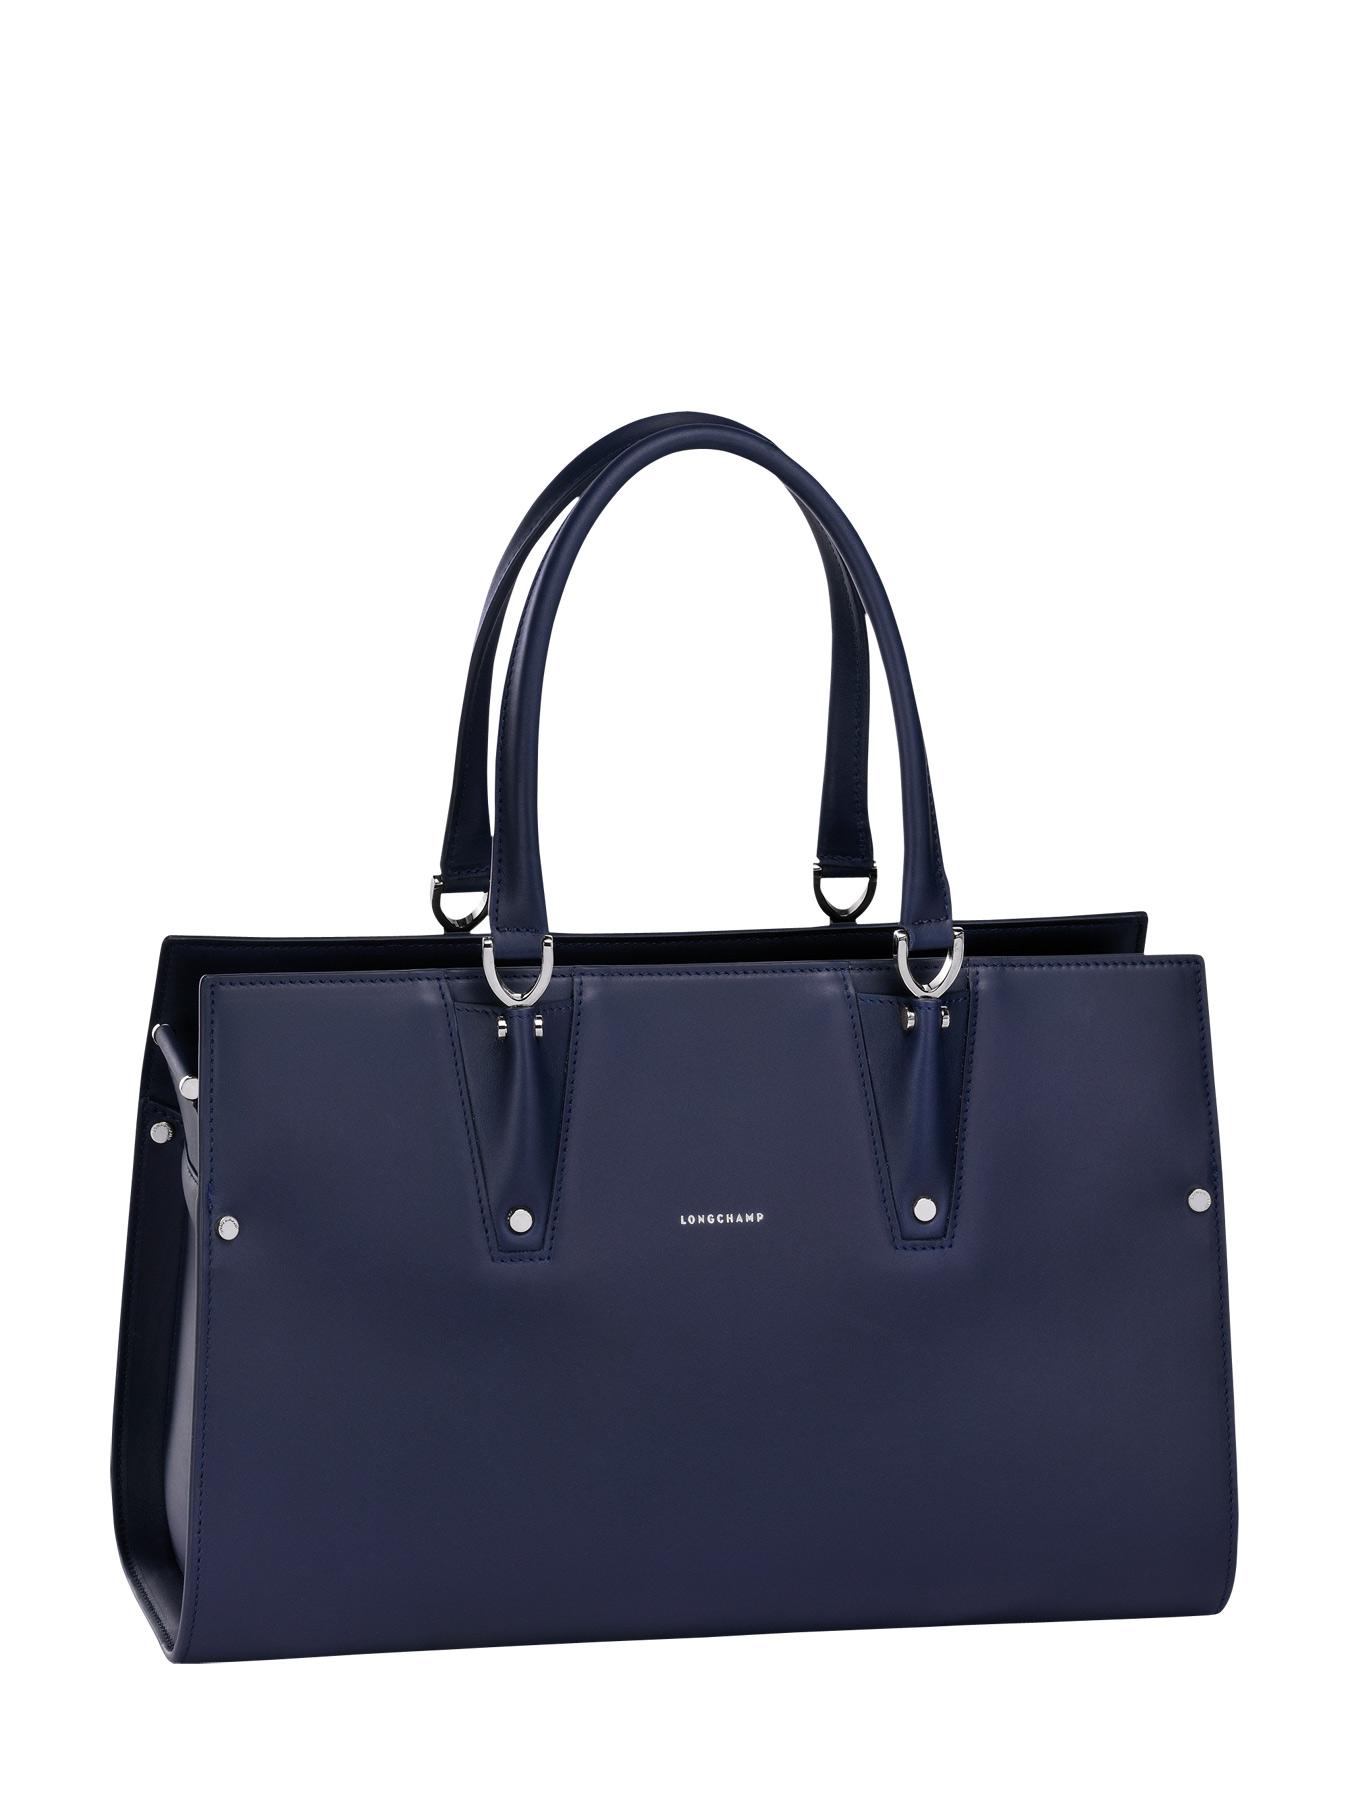 Longchamp Handbag 1321870 Free Shipping Available